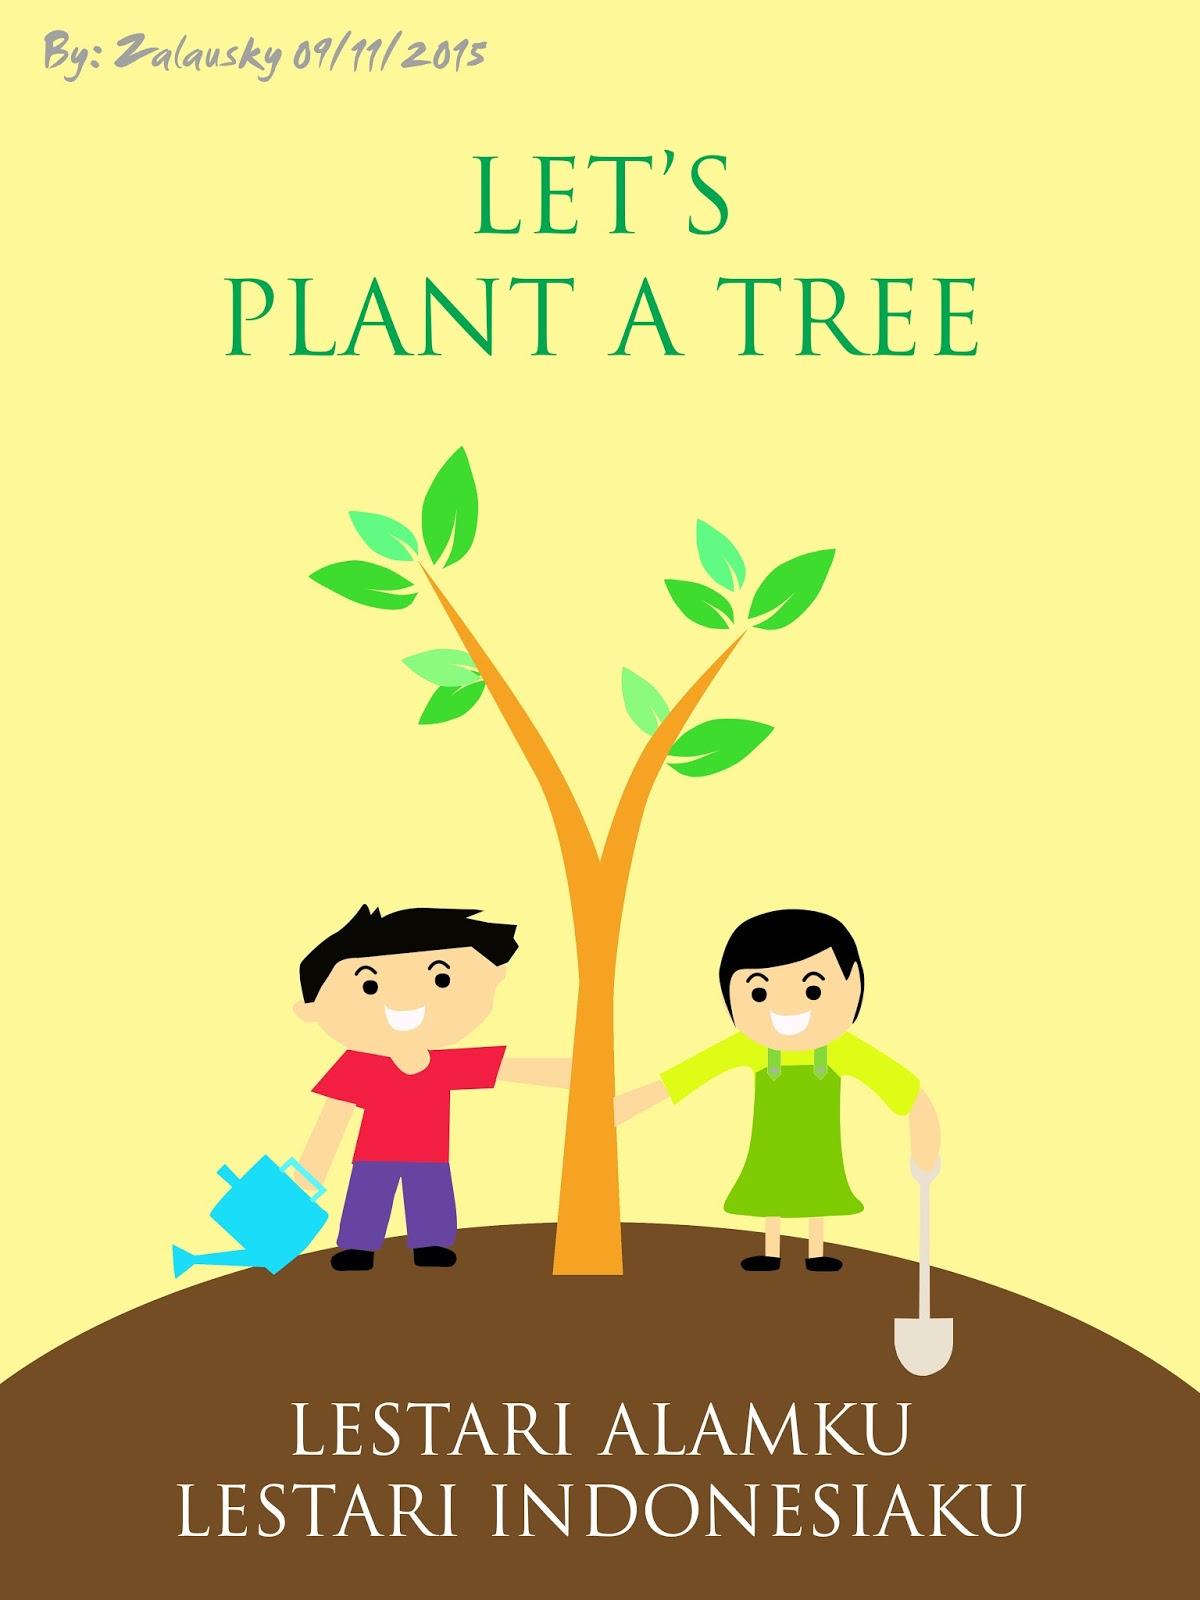 Lingkungan Hidup Mudah Digambar Contoh Poster Ide Poster